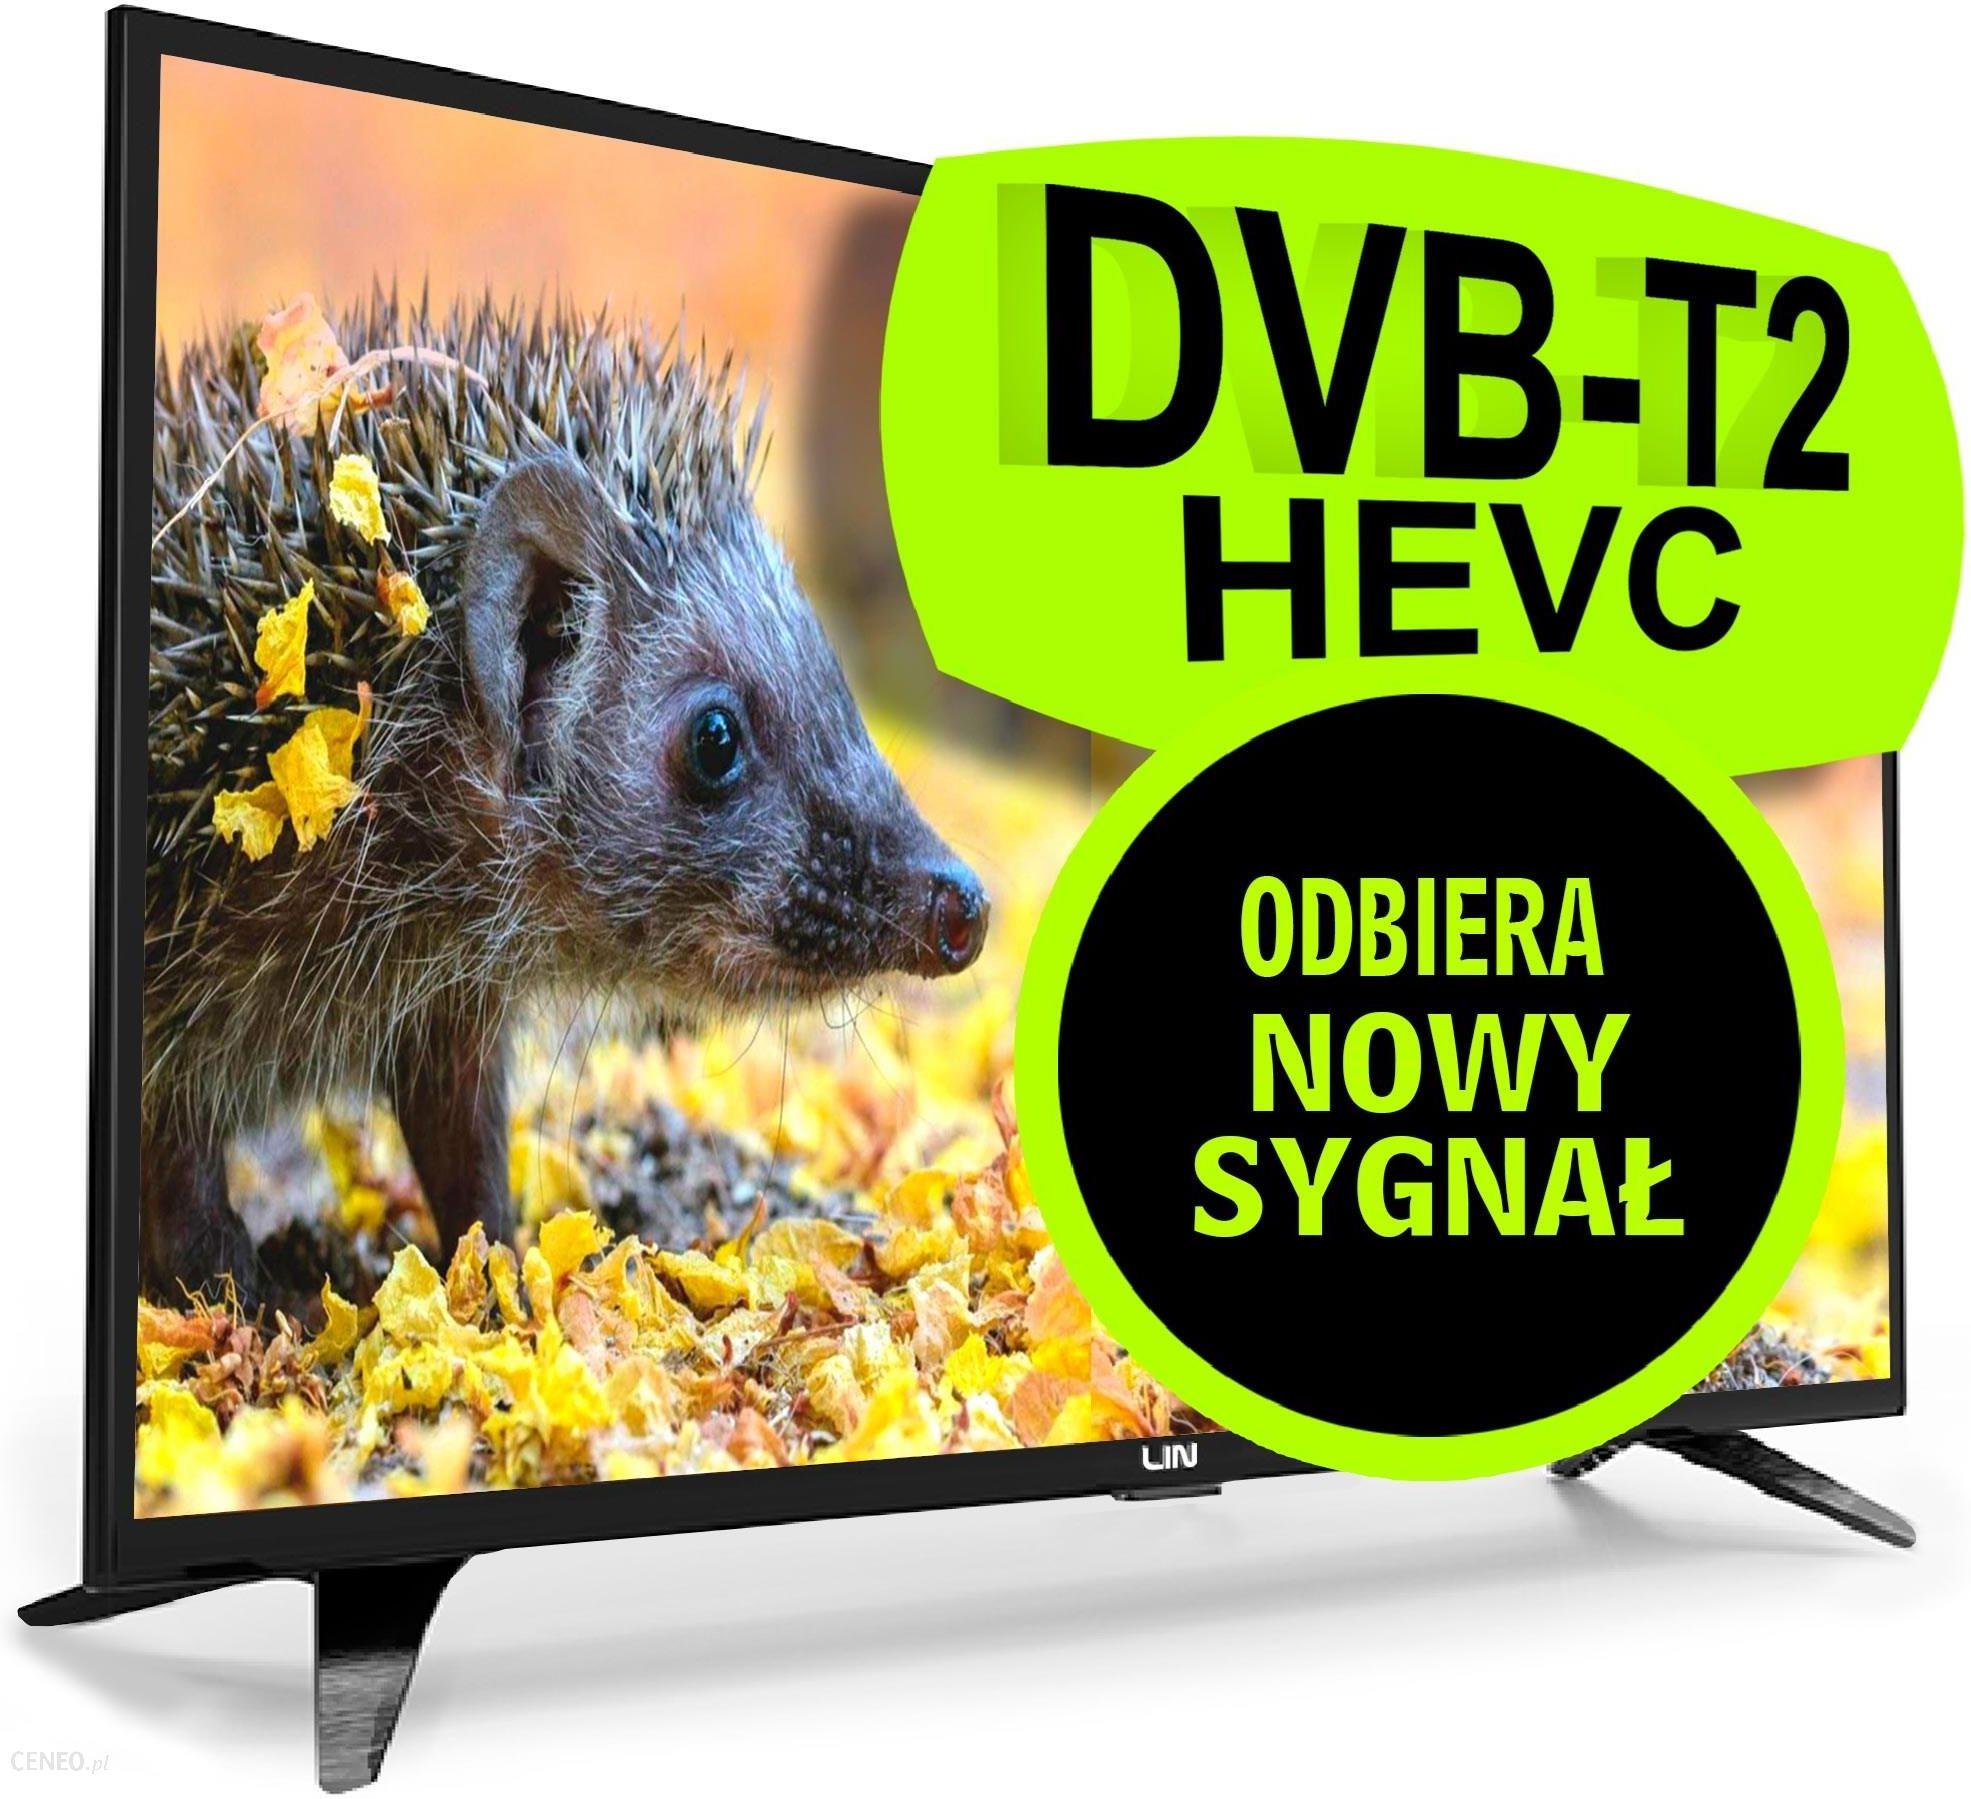 Lin 32LHD1510 televizorius